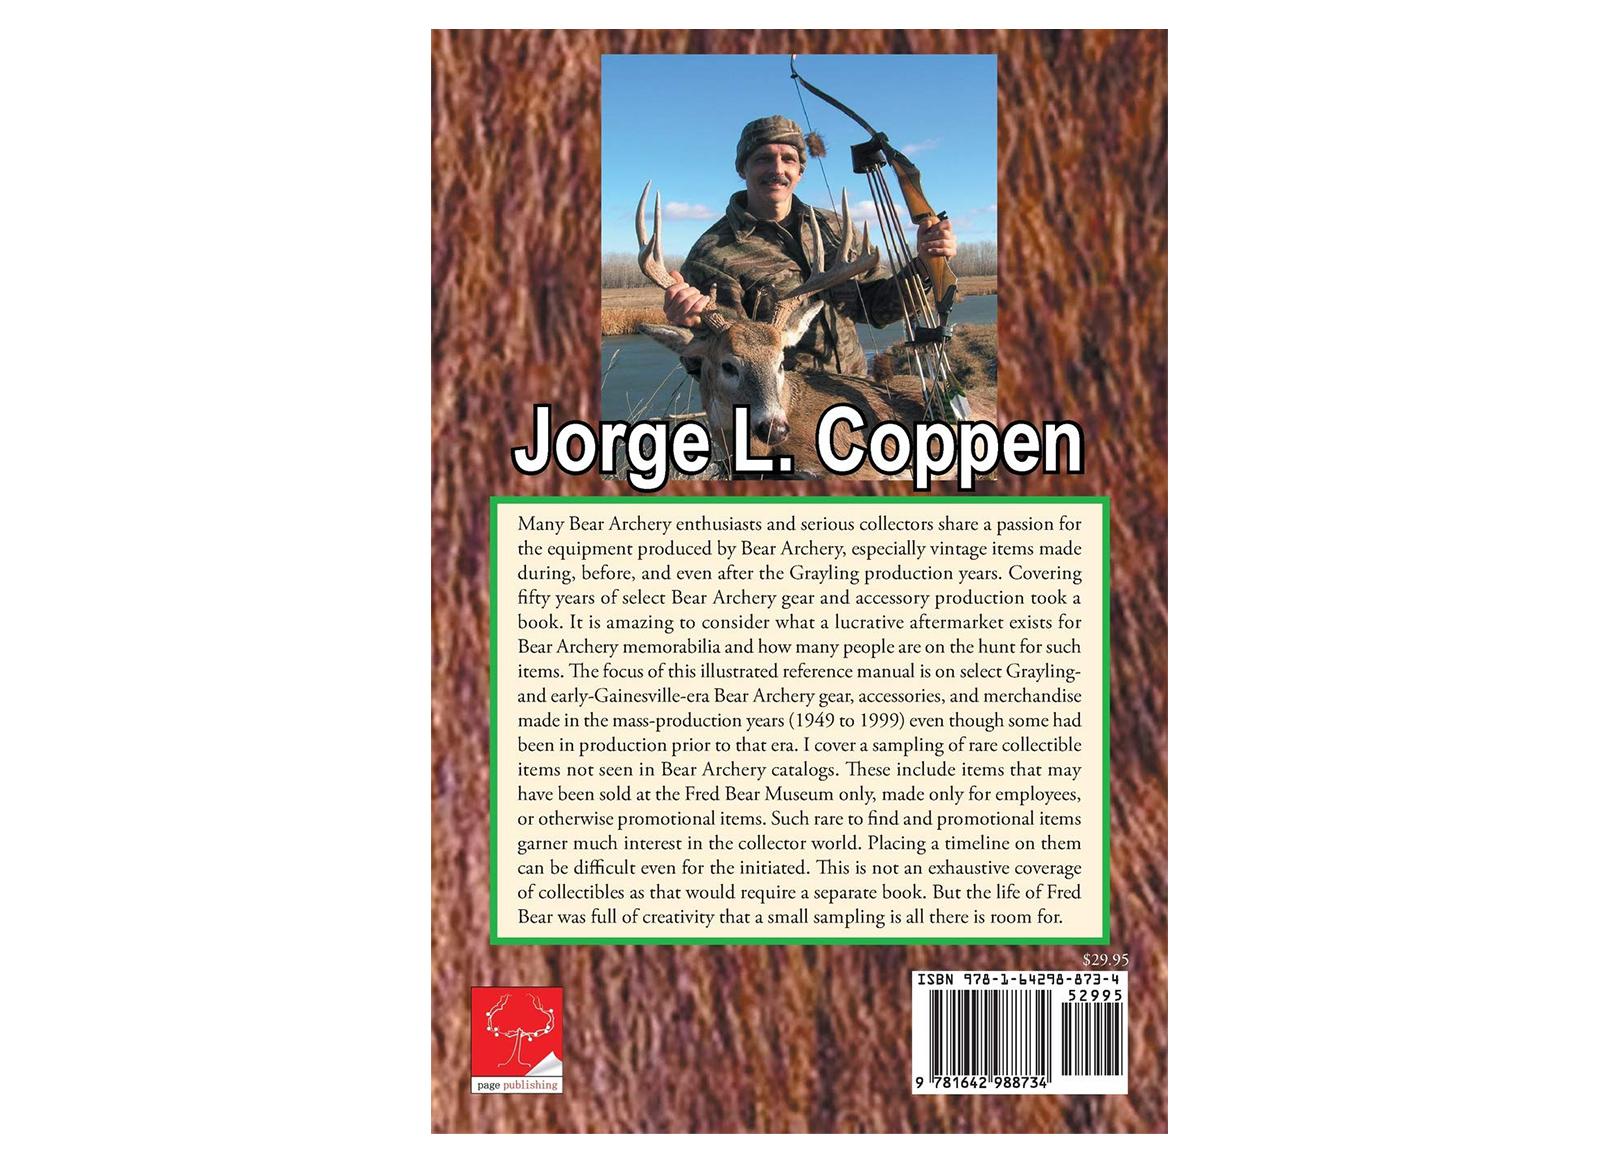 BEAR ARCHERY TRADITIONAL - LIBRO 'BEAR ARCHERY VINTAGE GEAR' DI JORGE COPPEN